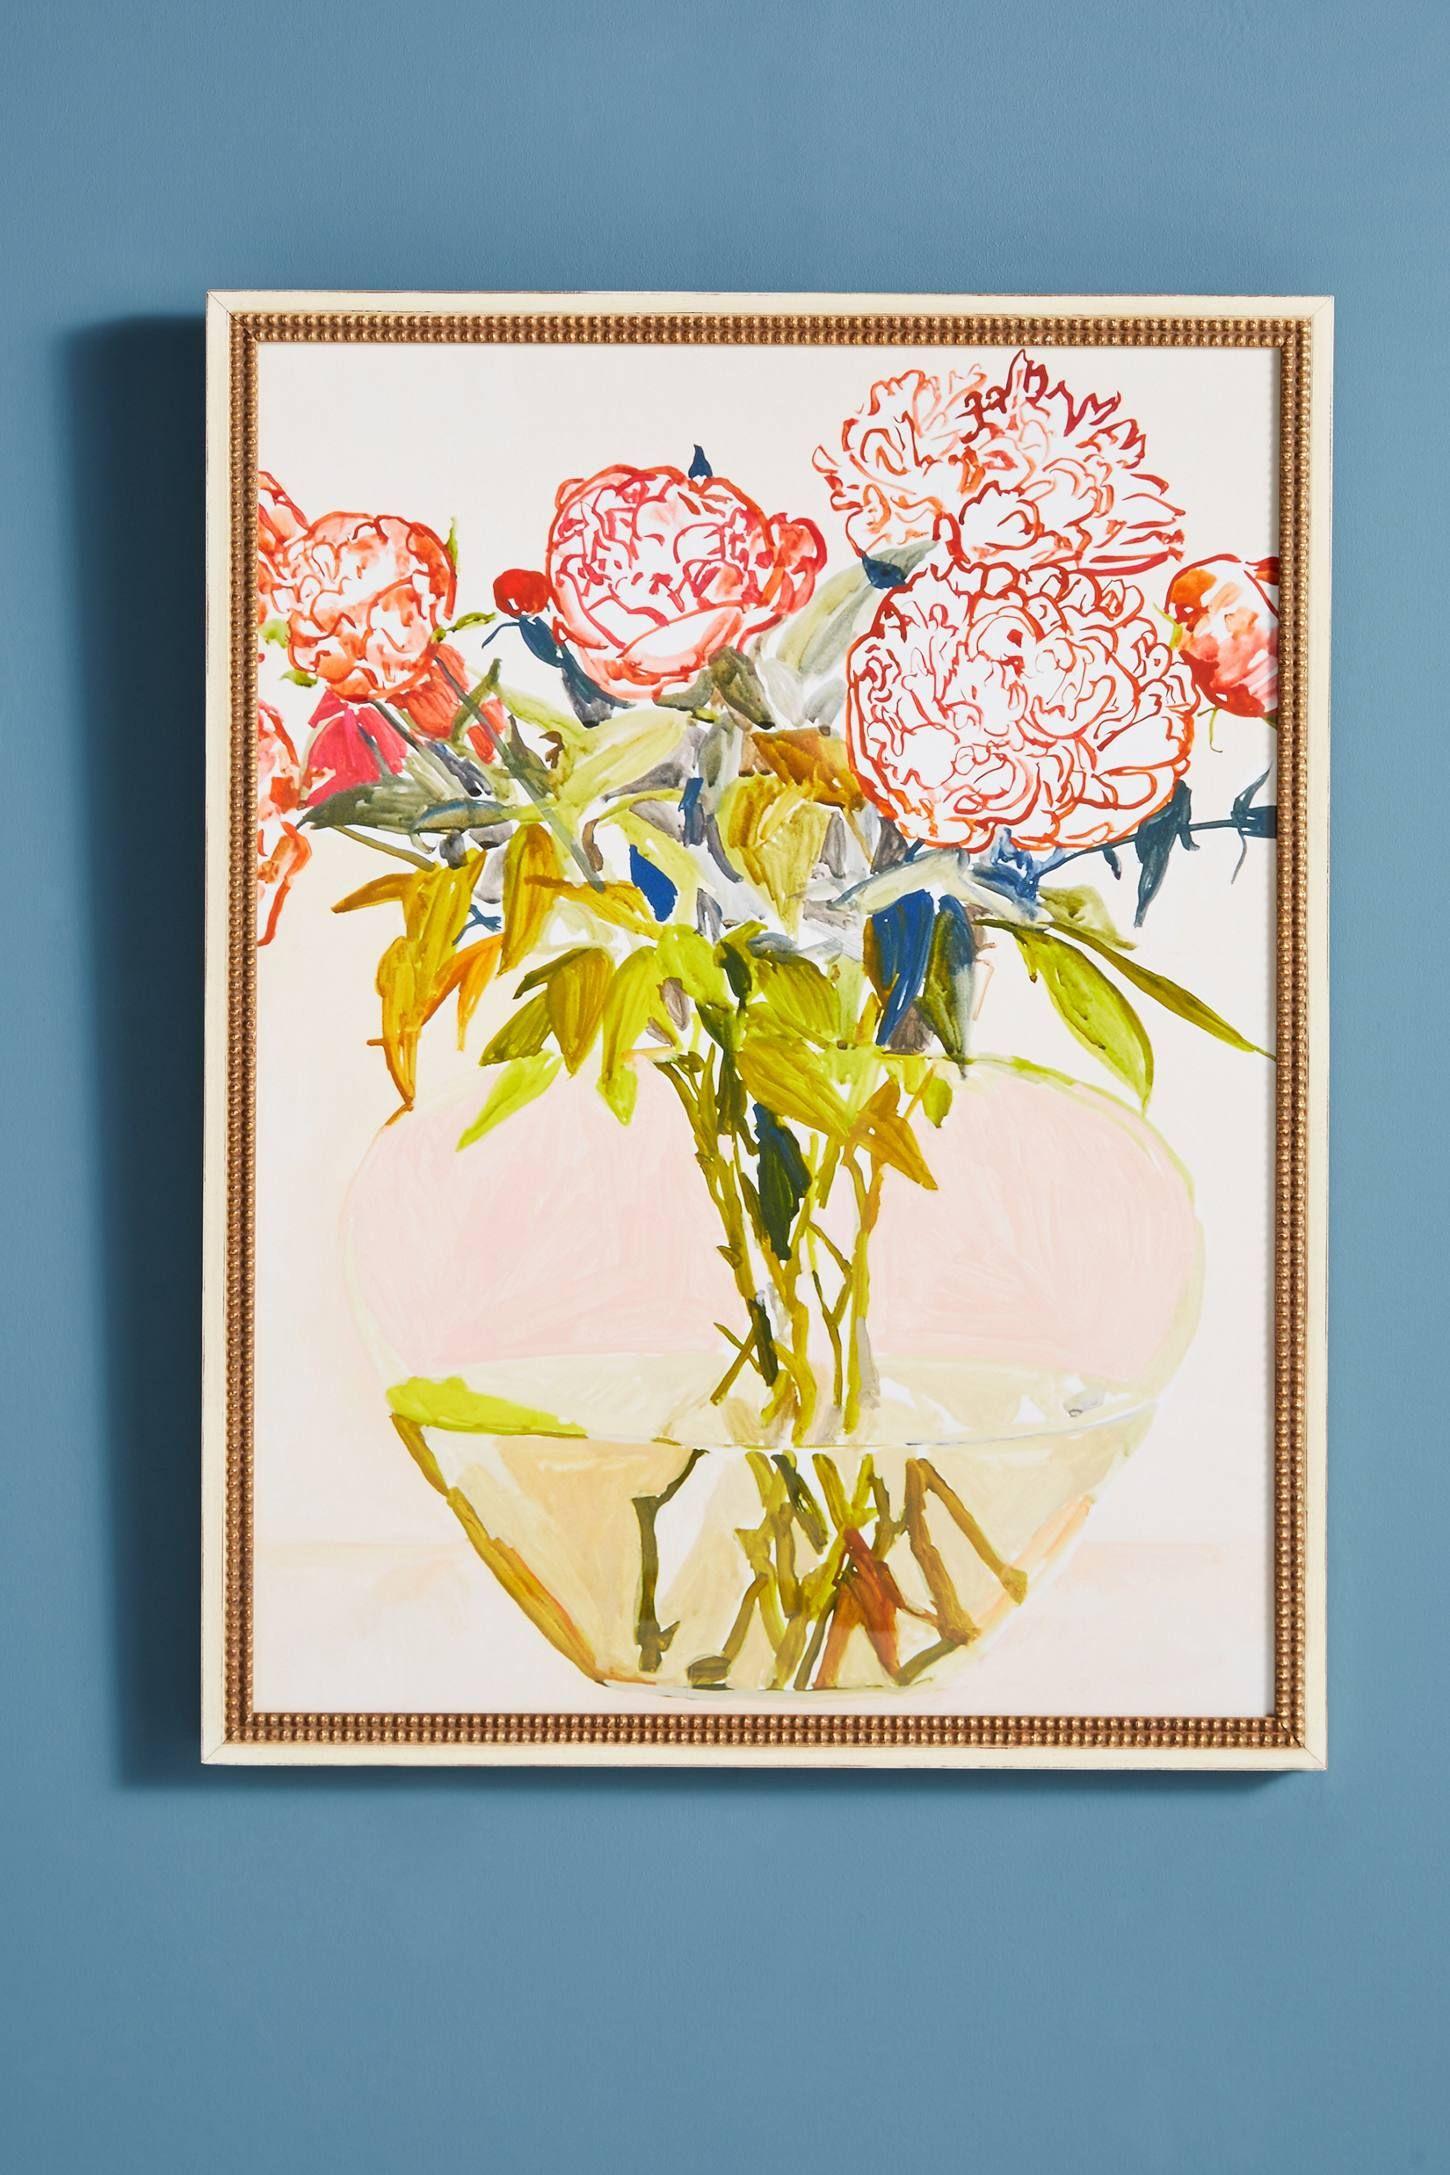 Thank You Wall Art   Pinterest   Art illustrations, Artsy and Art prints